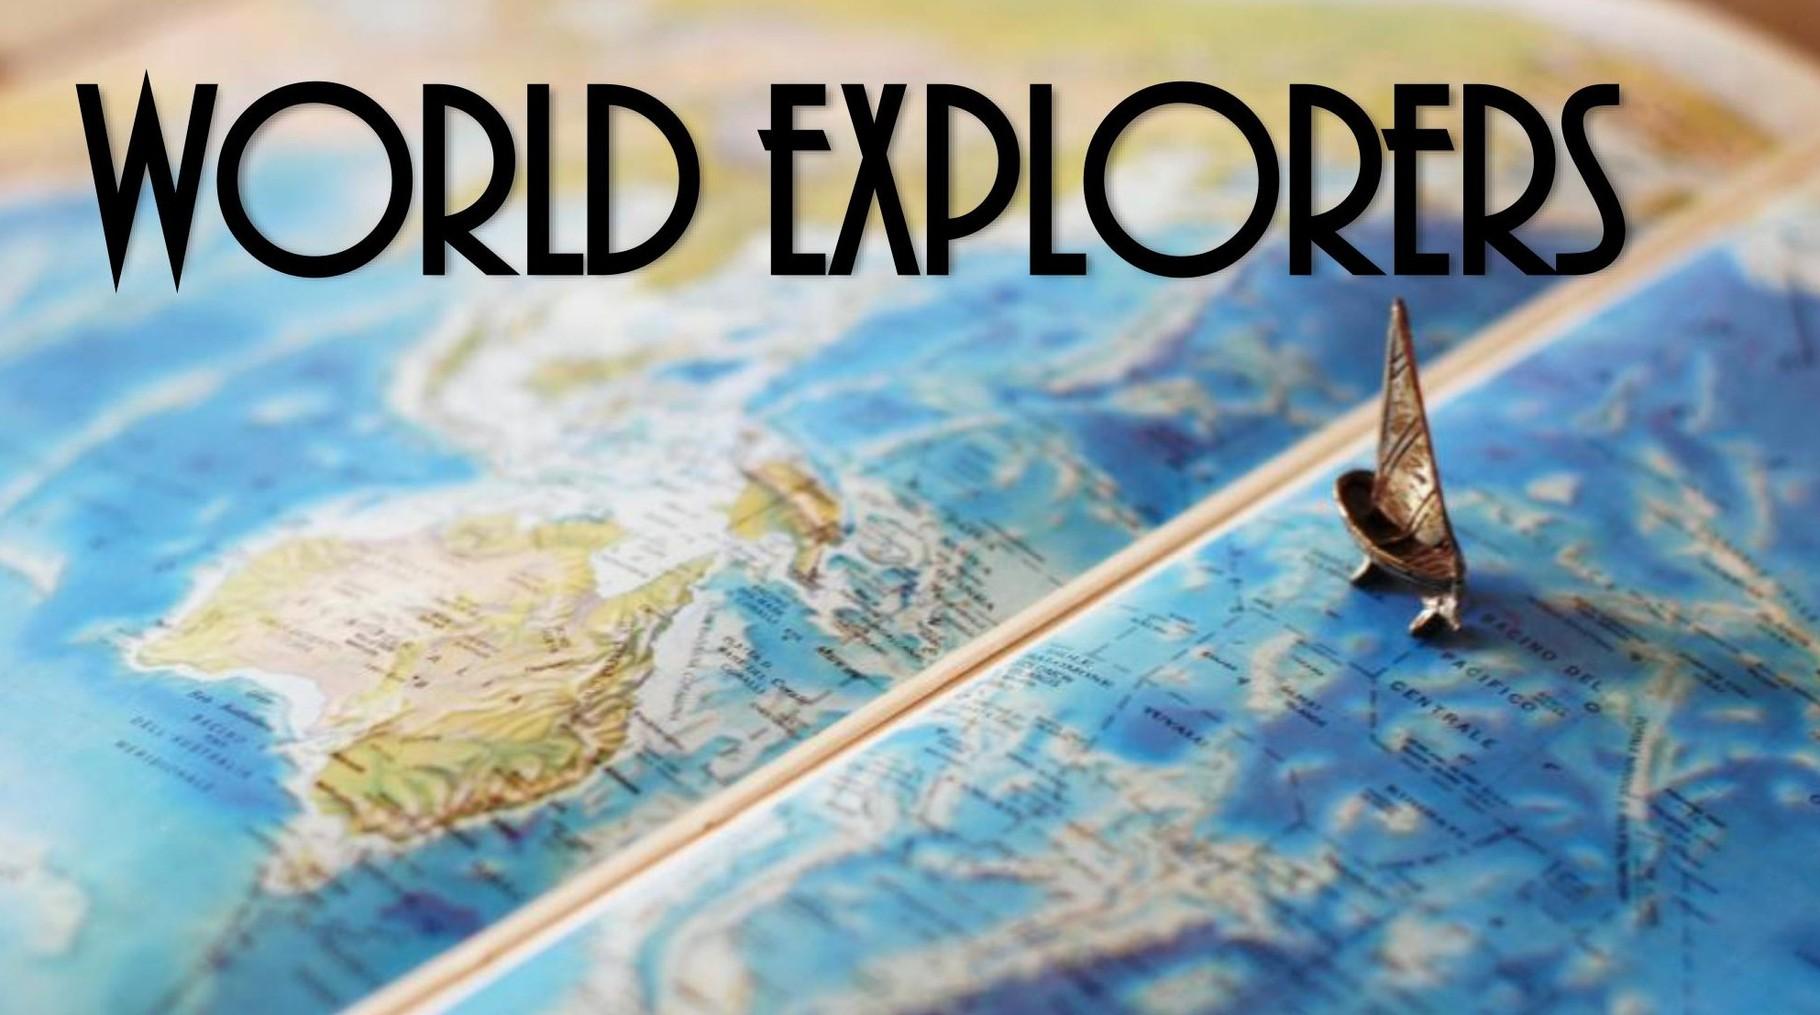 http://worldexplorers.jimdo.com/